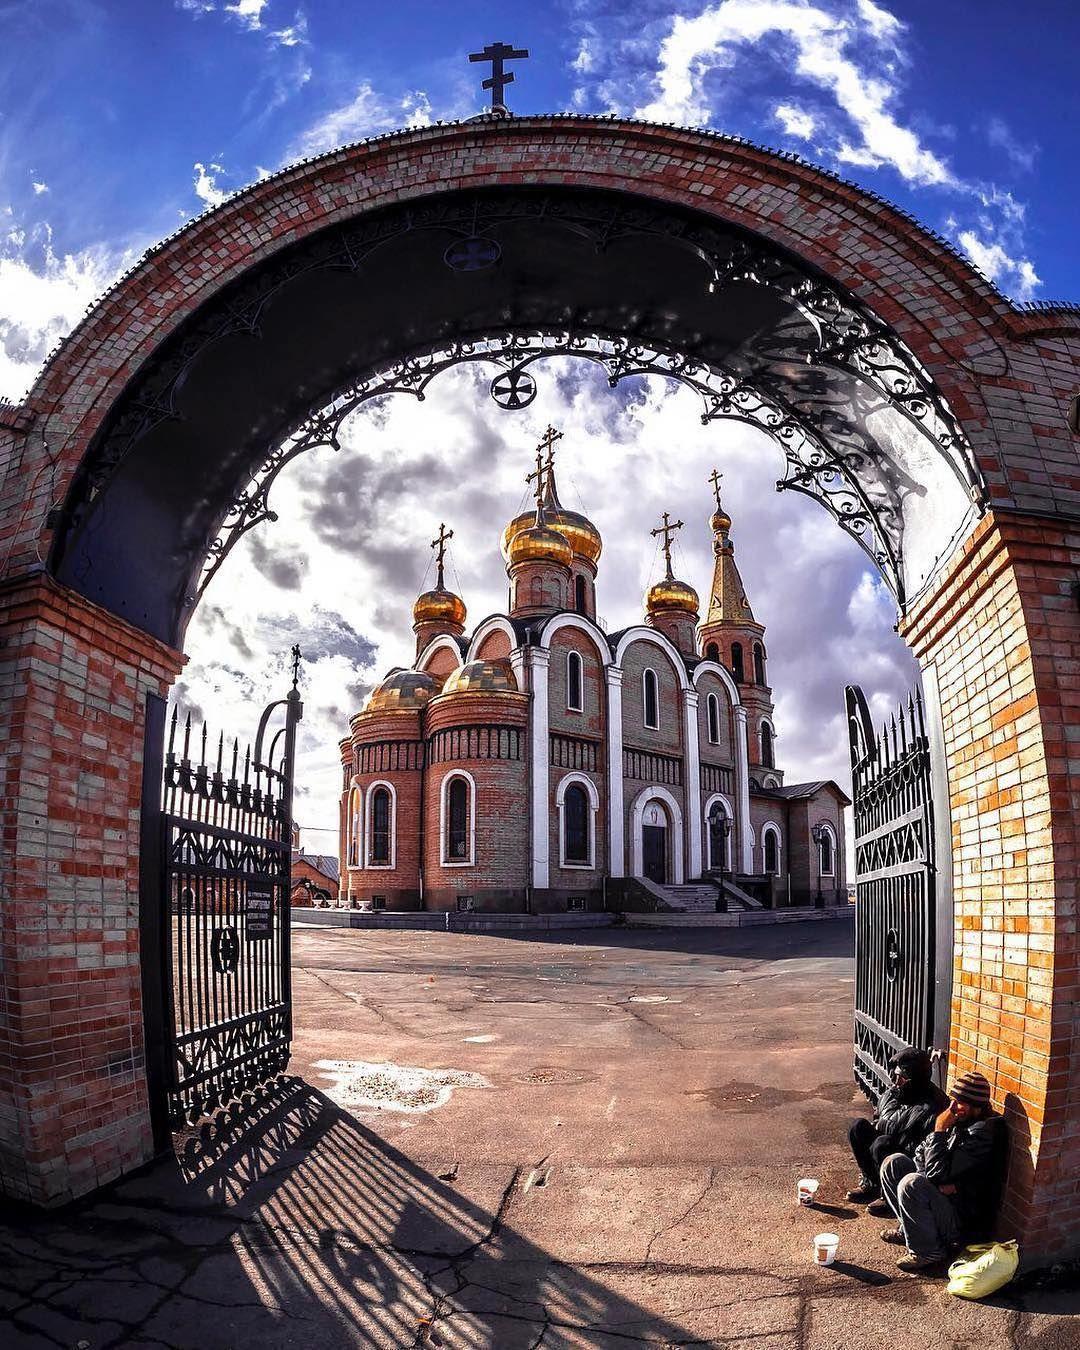 Cathedral of Peter and Paul, Novotroitsk, Orenburg region